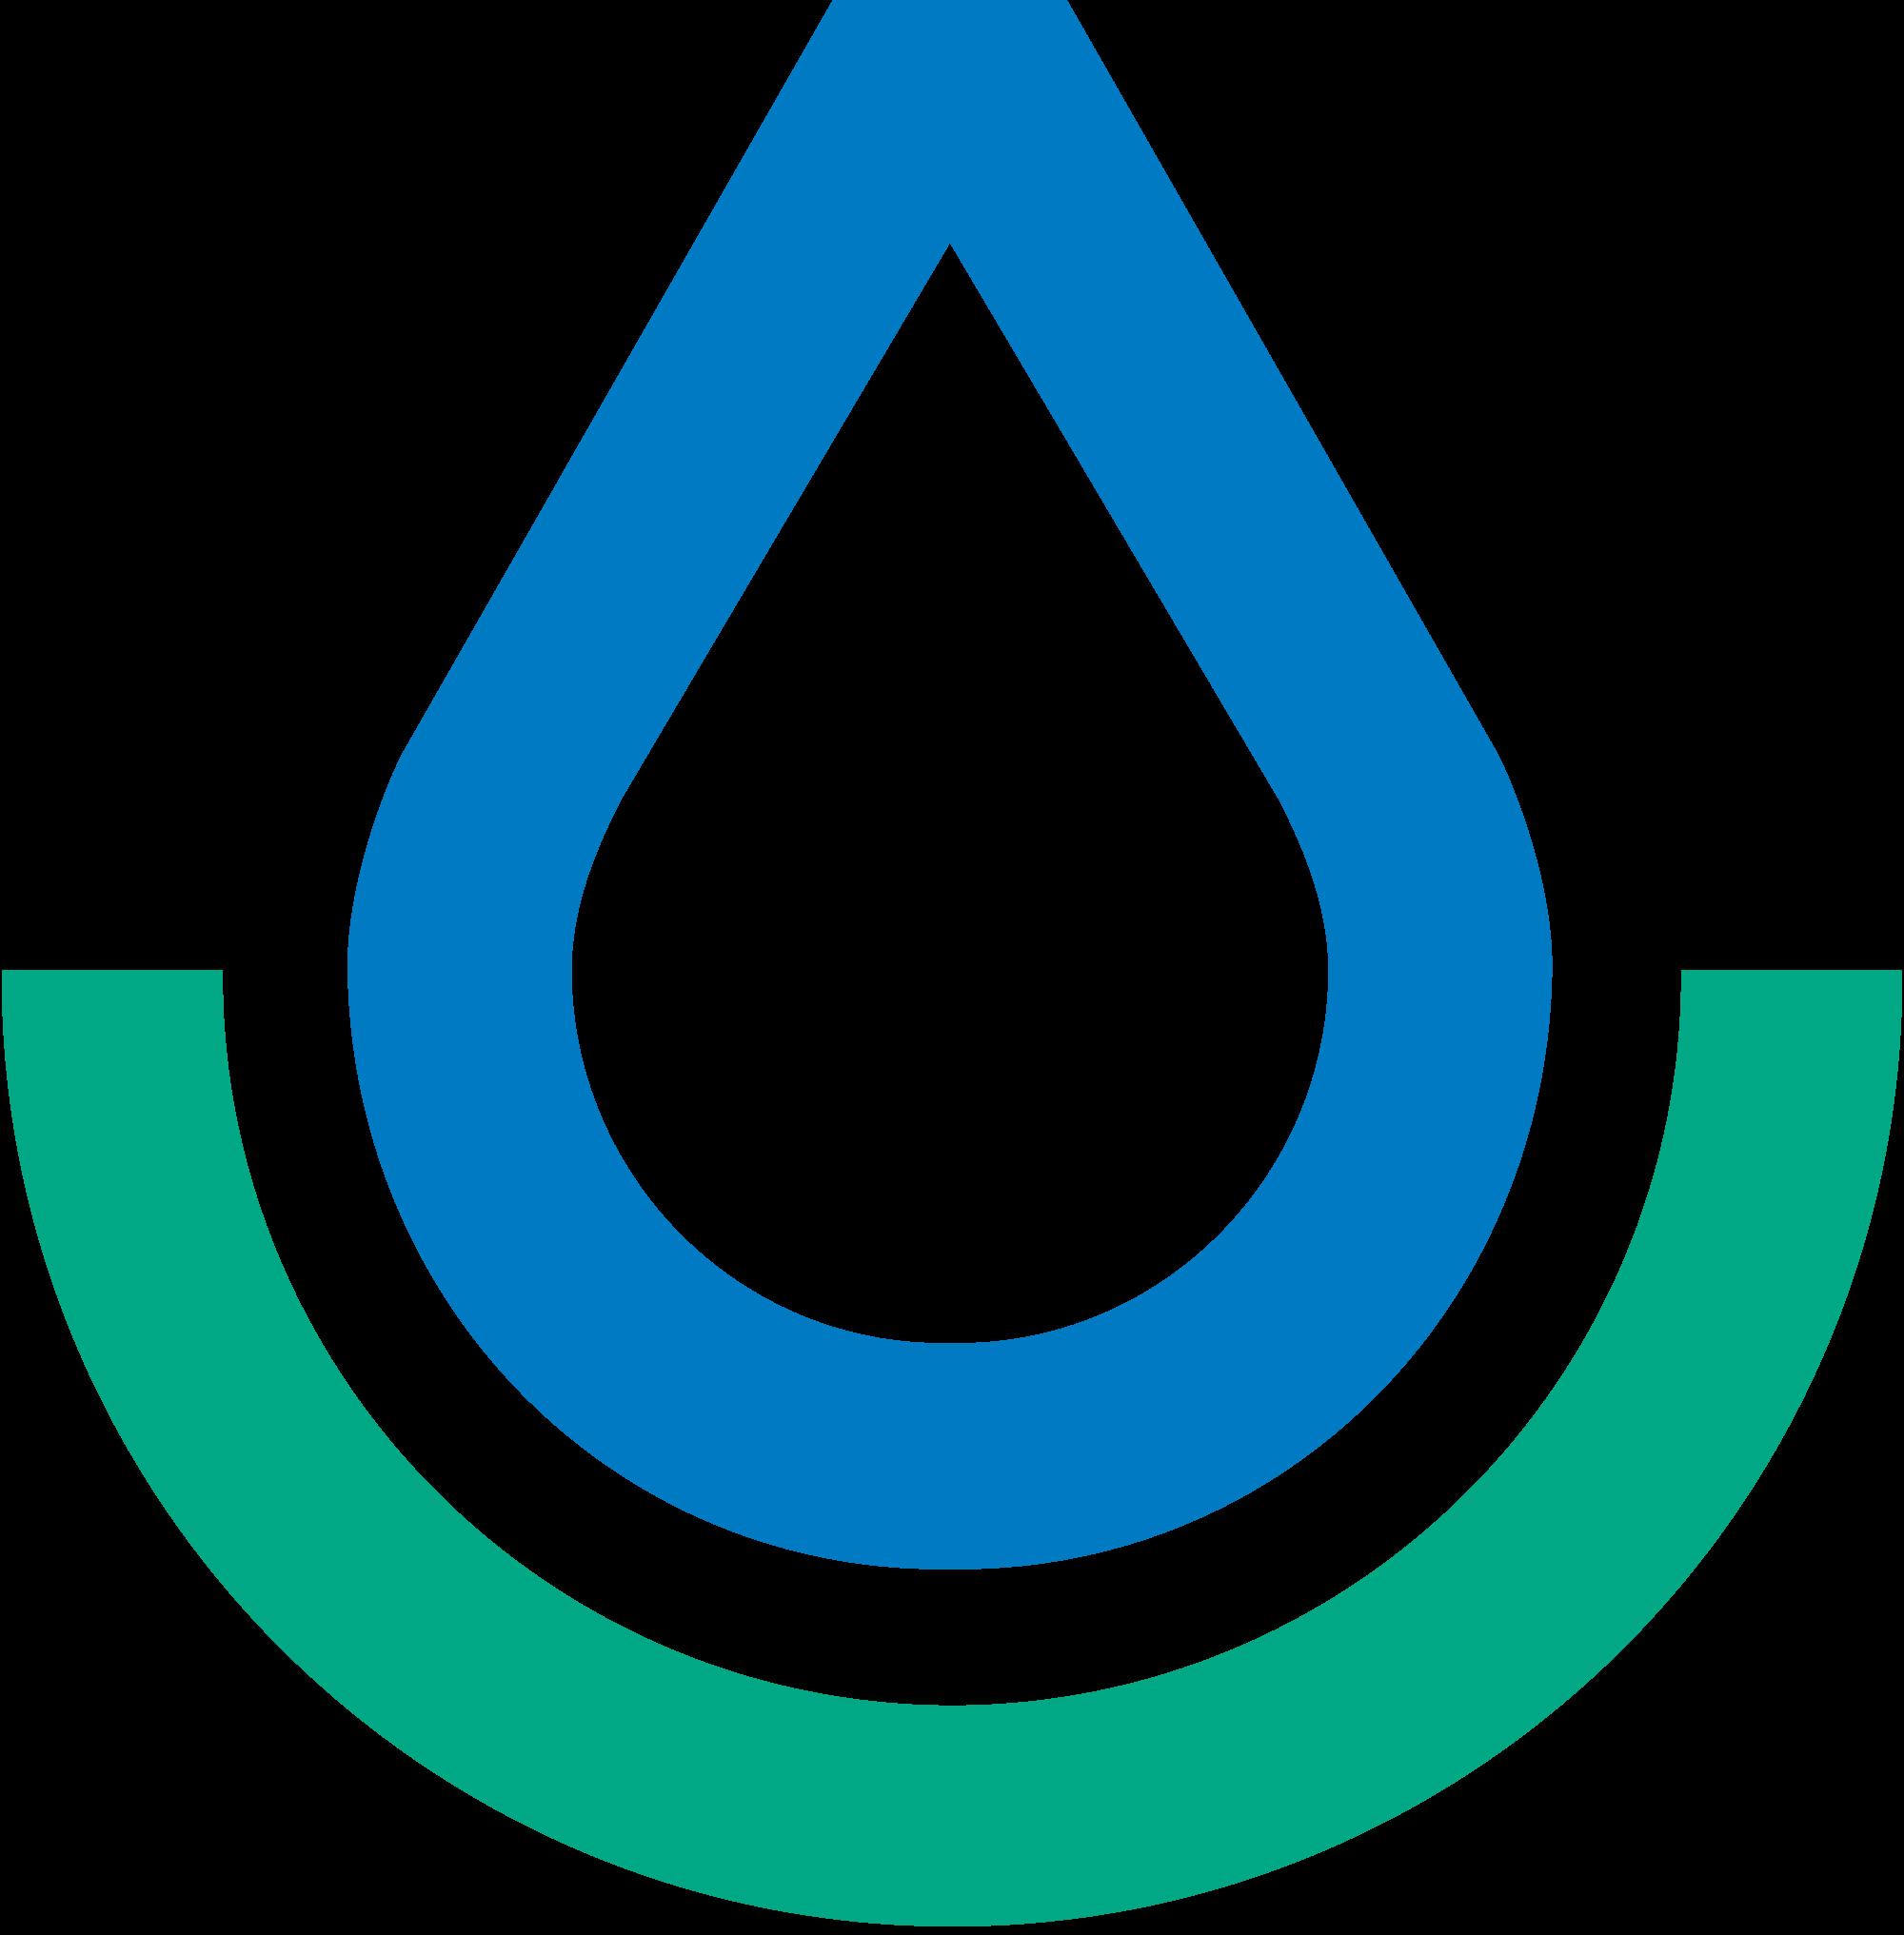 Logos and graphics nrcs. Raindrop clipart banner